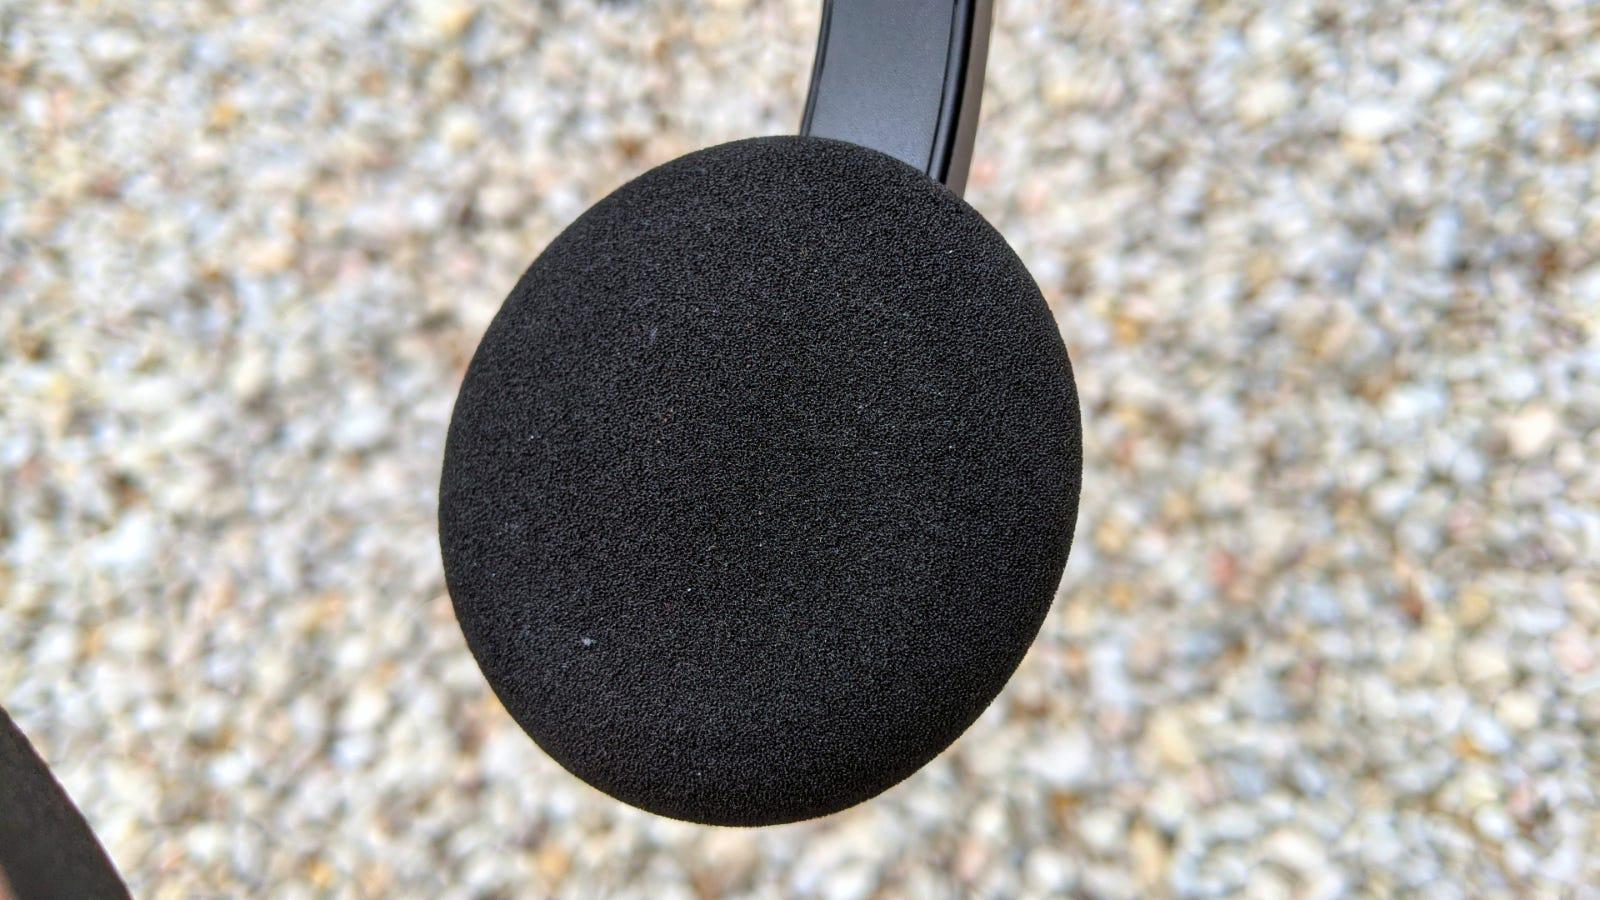 Close-up of the Sound Blaster Jam V2 ear cushion